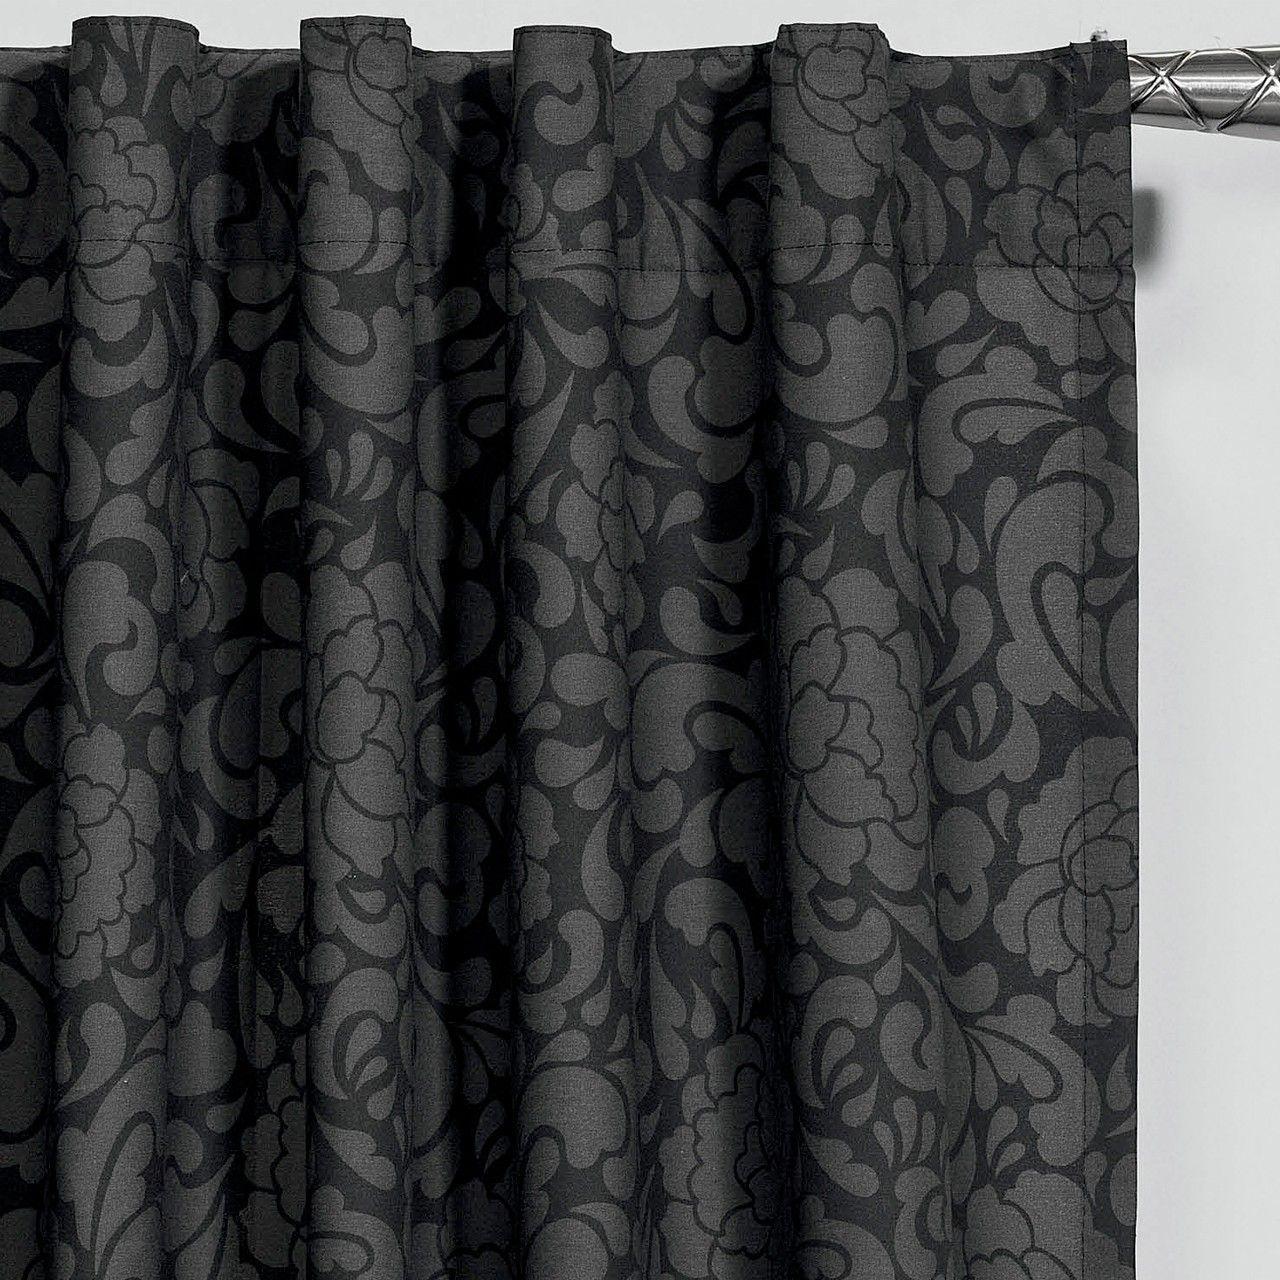 Cortinas vintage dormitorio cortinas cortinas for Cortinas vintage dormitorio